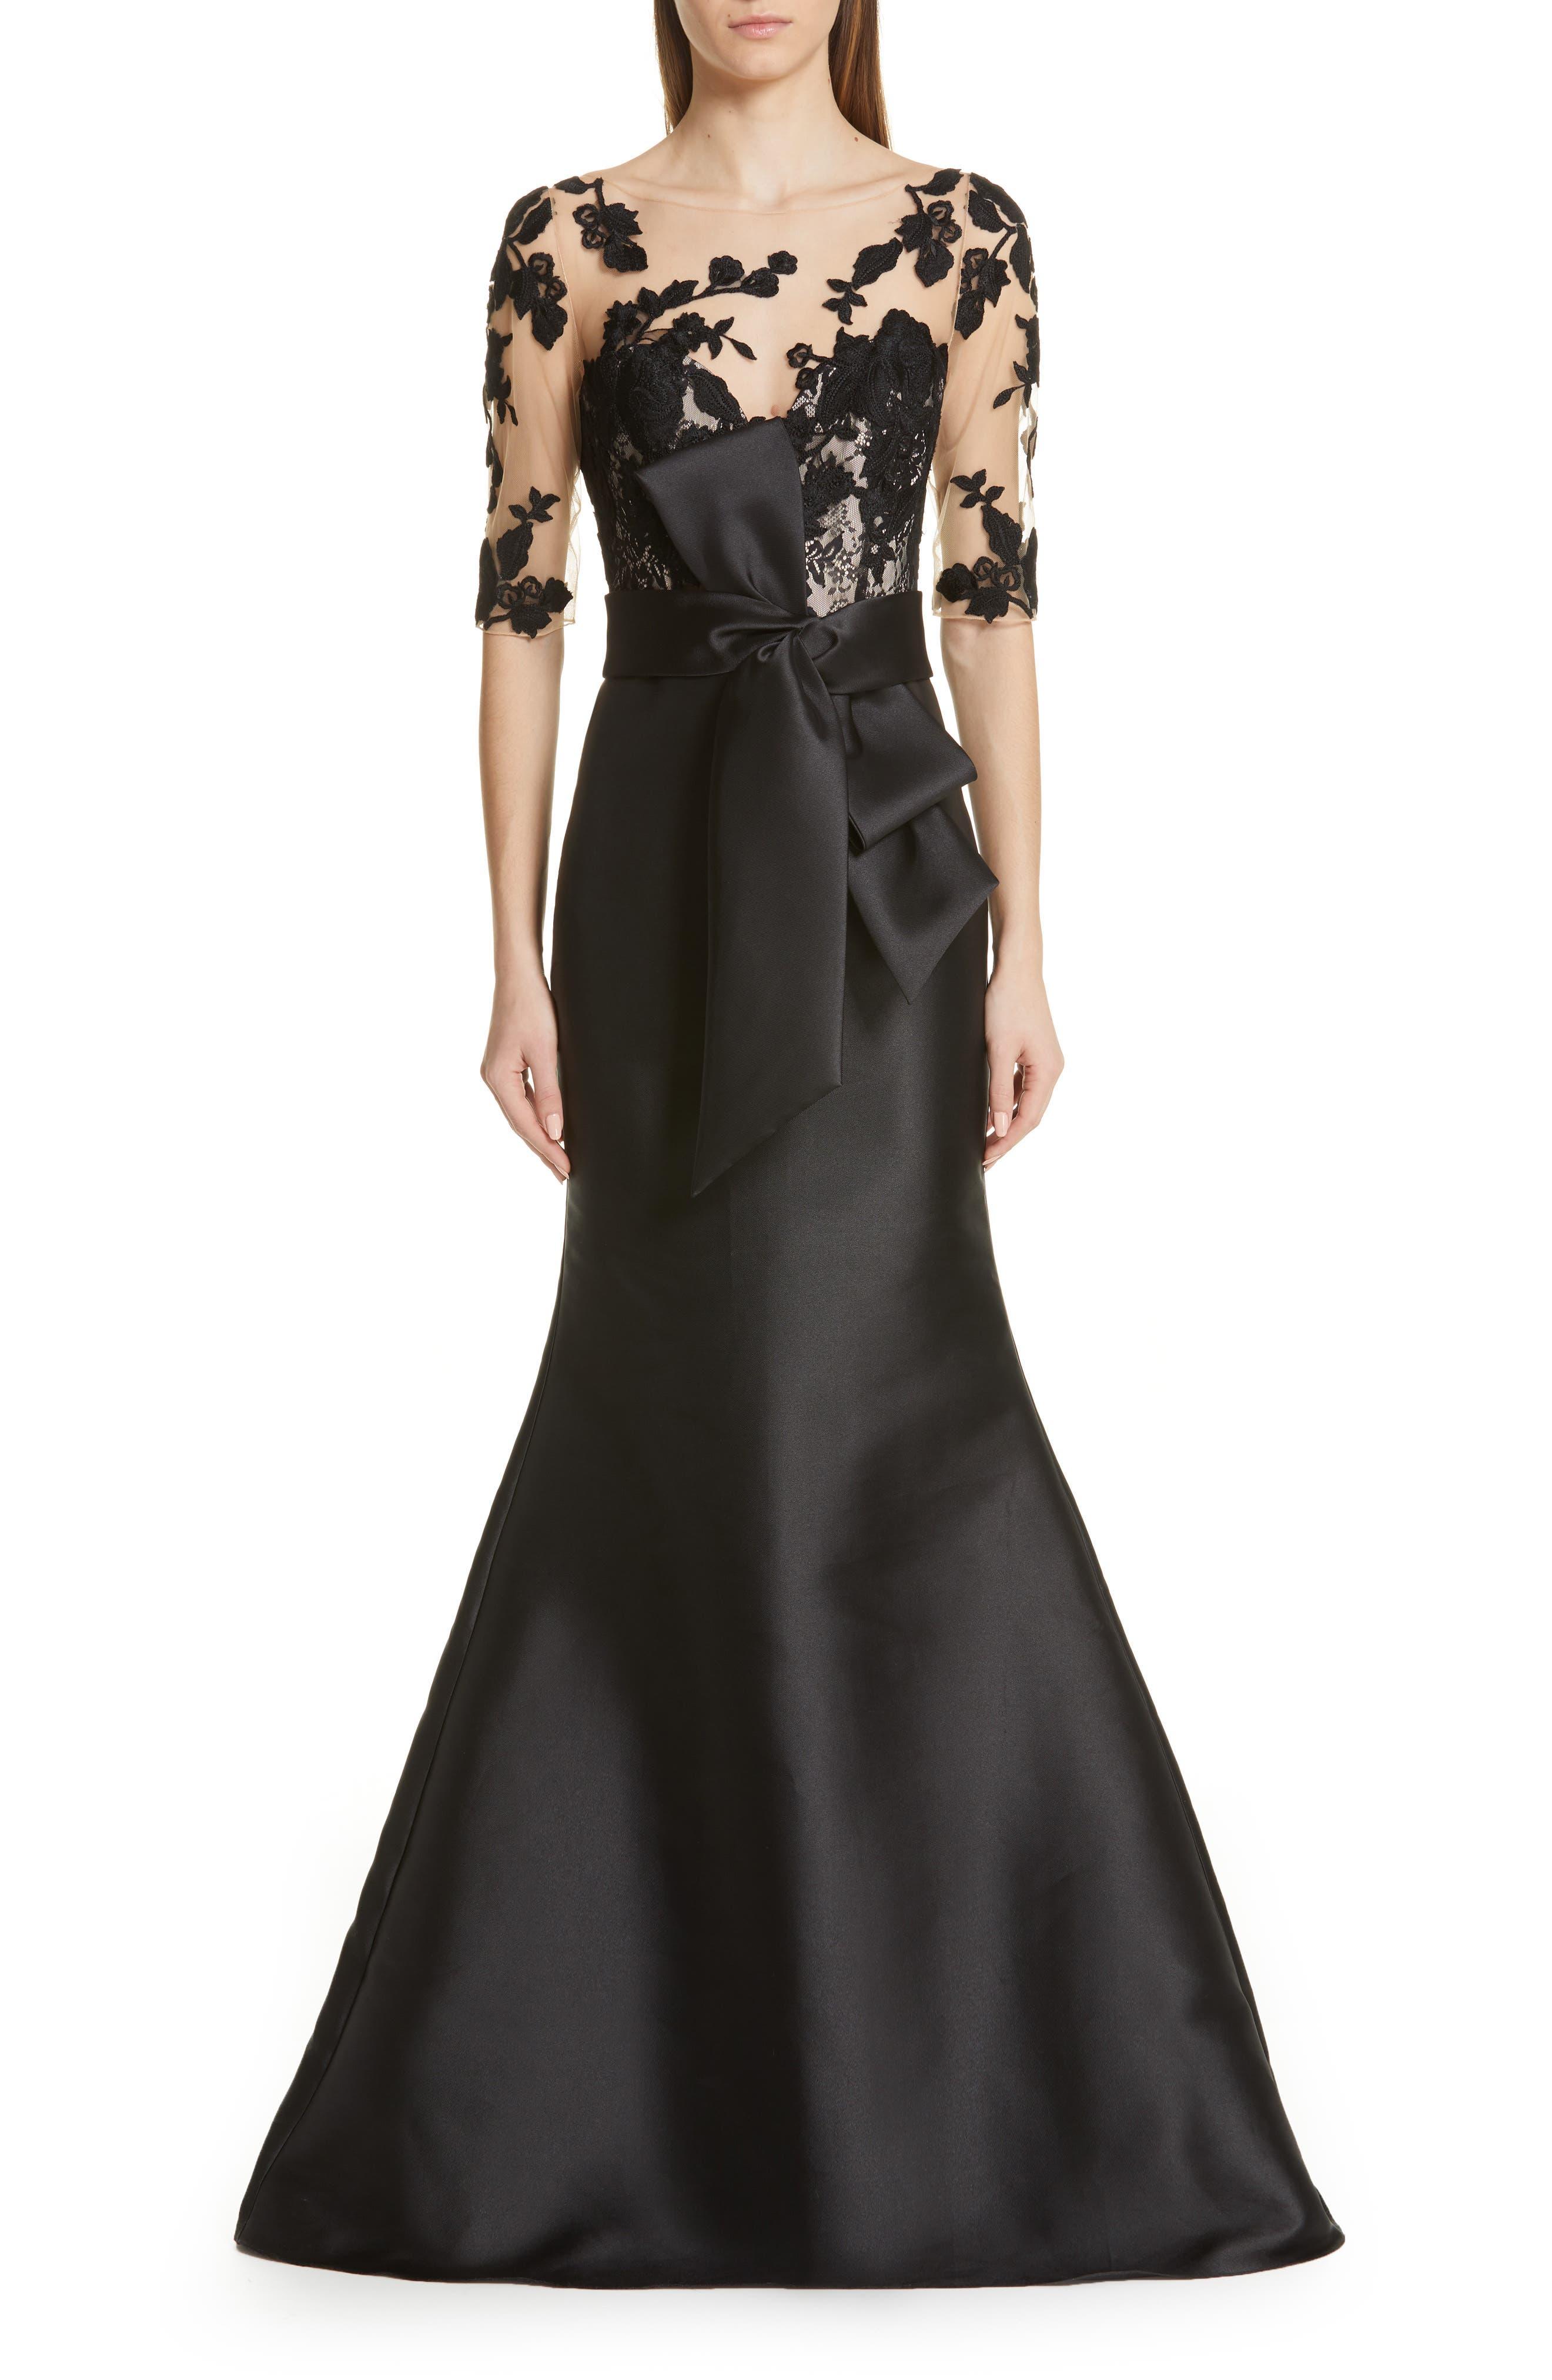 Badgley Mischka Lace Accent Bow Evening Dress, Black